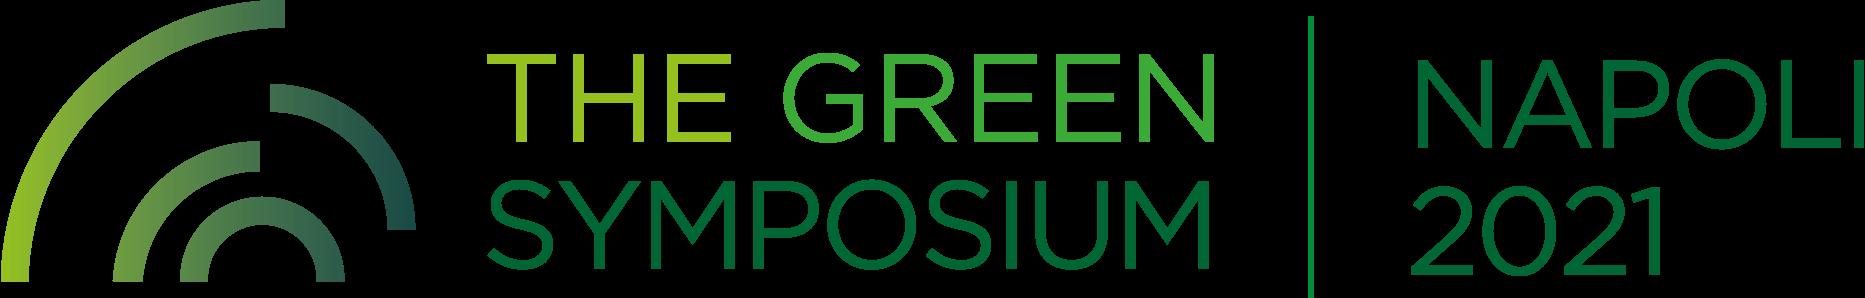 Green Symposium 2021